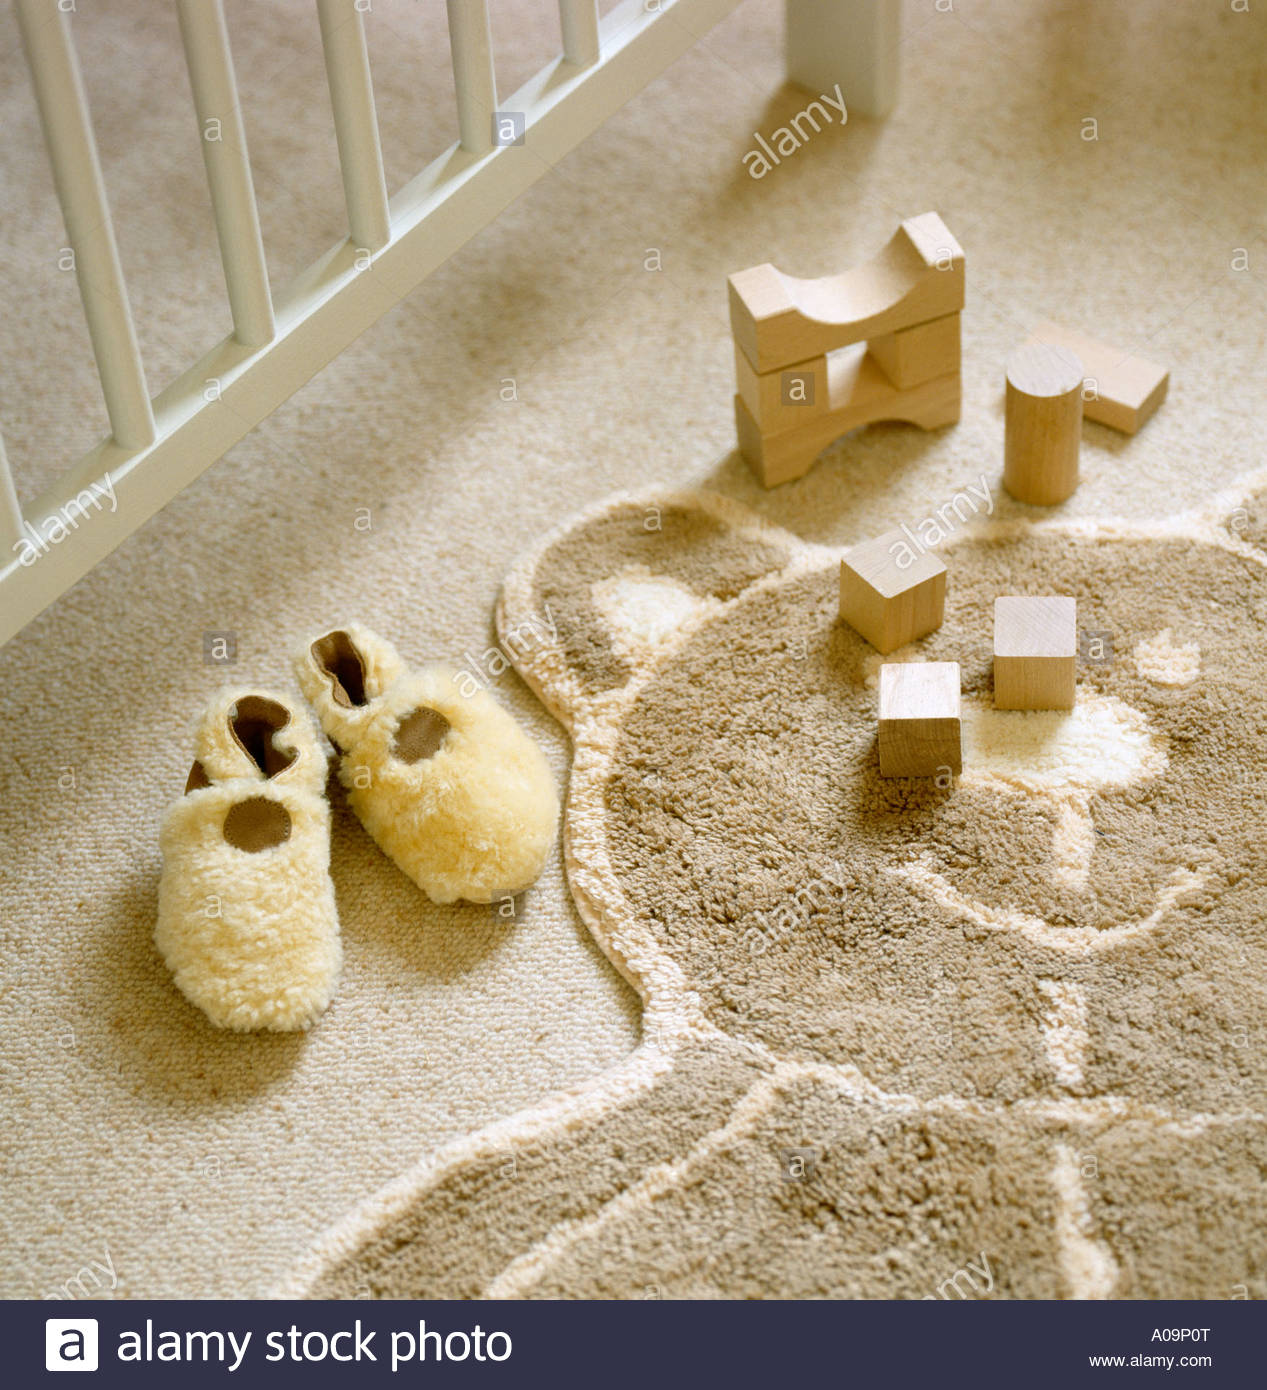 High Quality Stock Photo   Teddy Bear Rug With Building Blocks And Slippers On Nursery  Floor